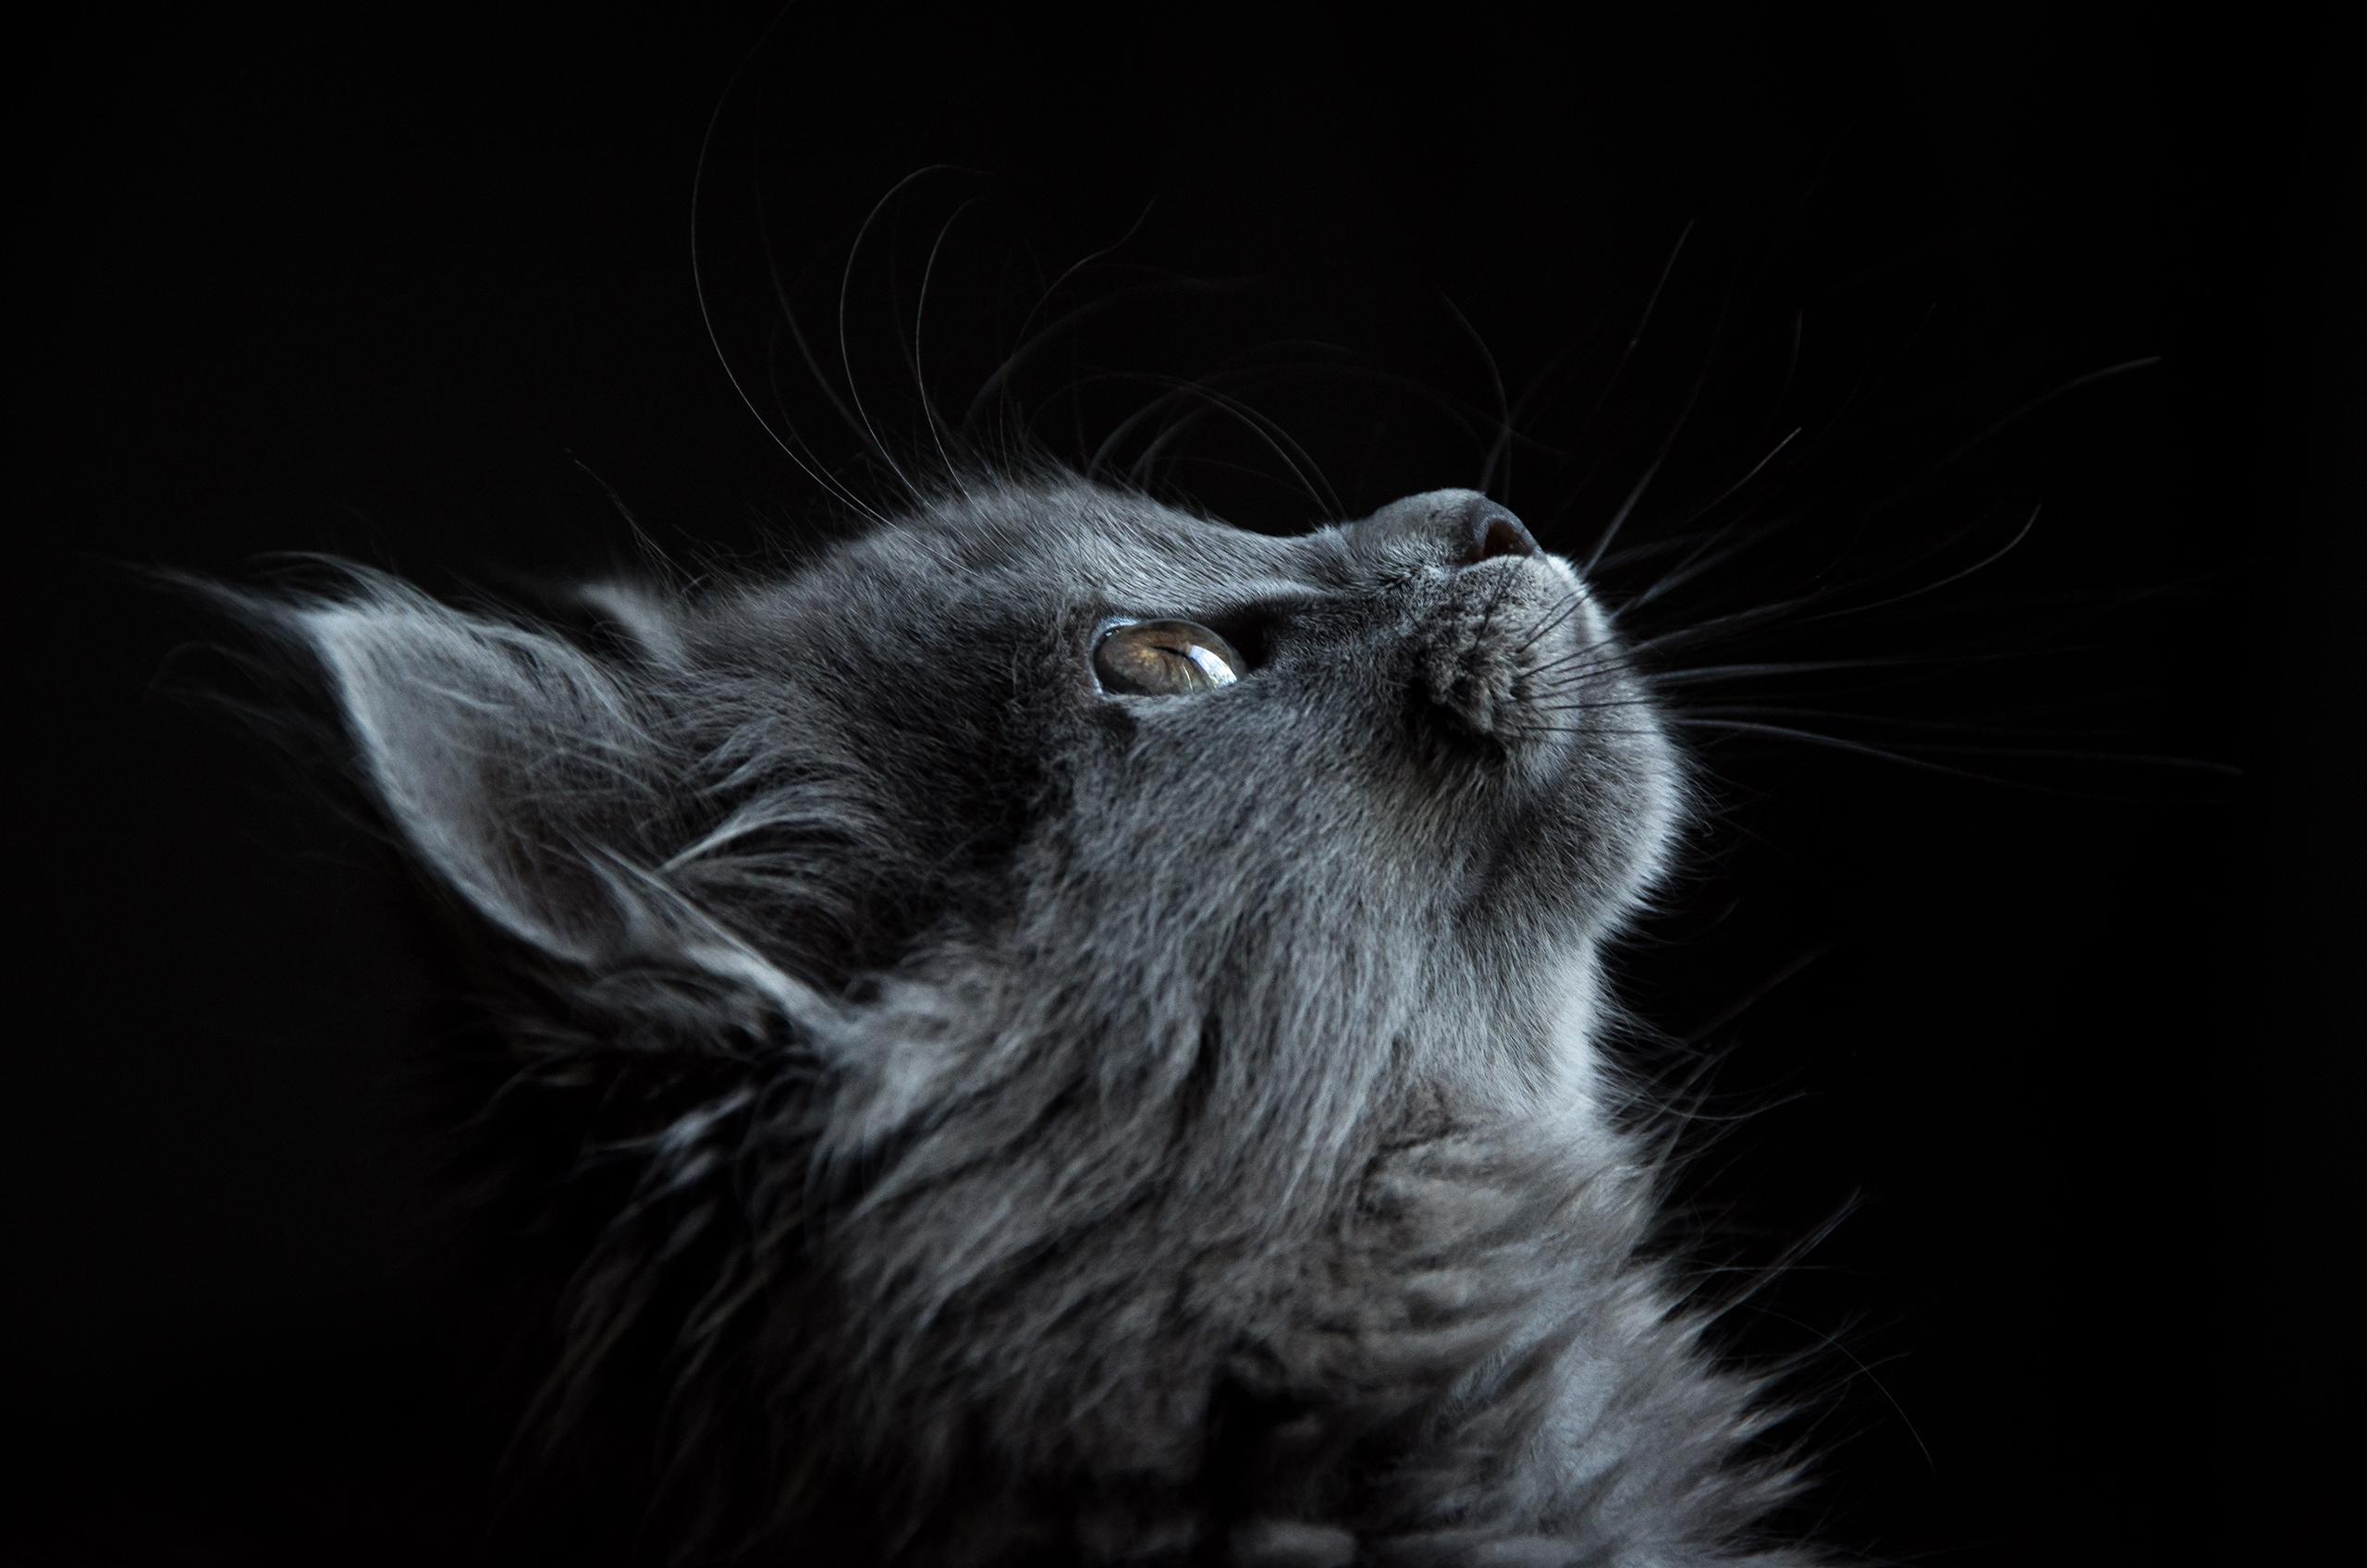 adorable-animal-cat-730896